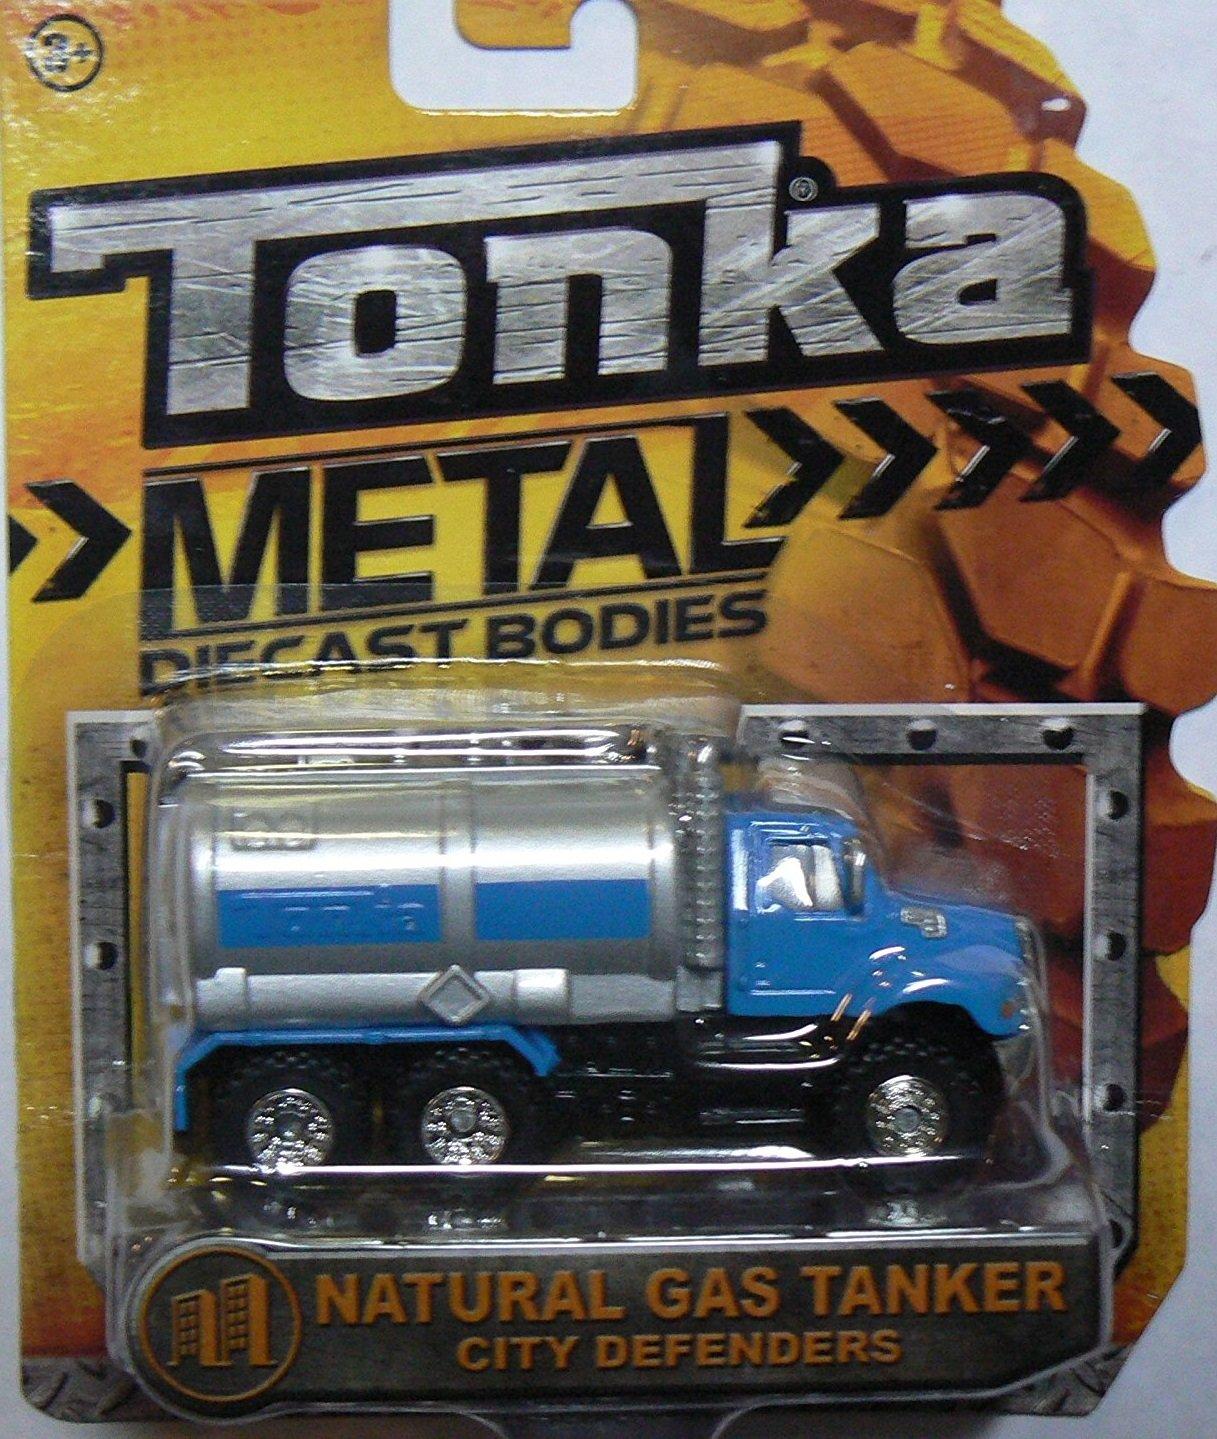 Tonka Metal Diecast Bodies City Defenders - Natural Gas Tanker by Tonka